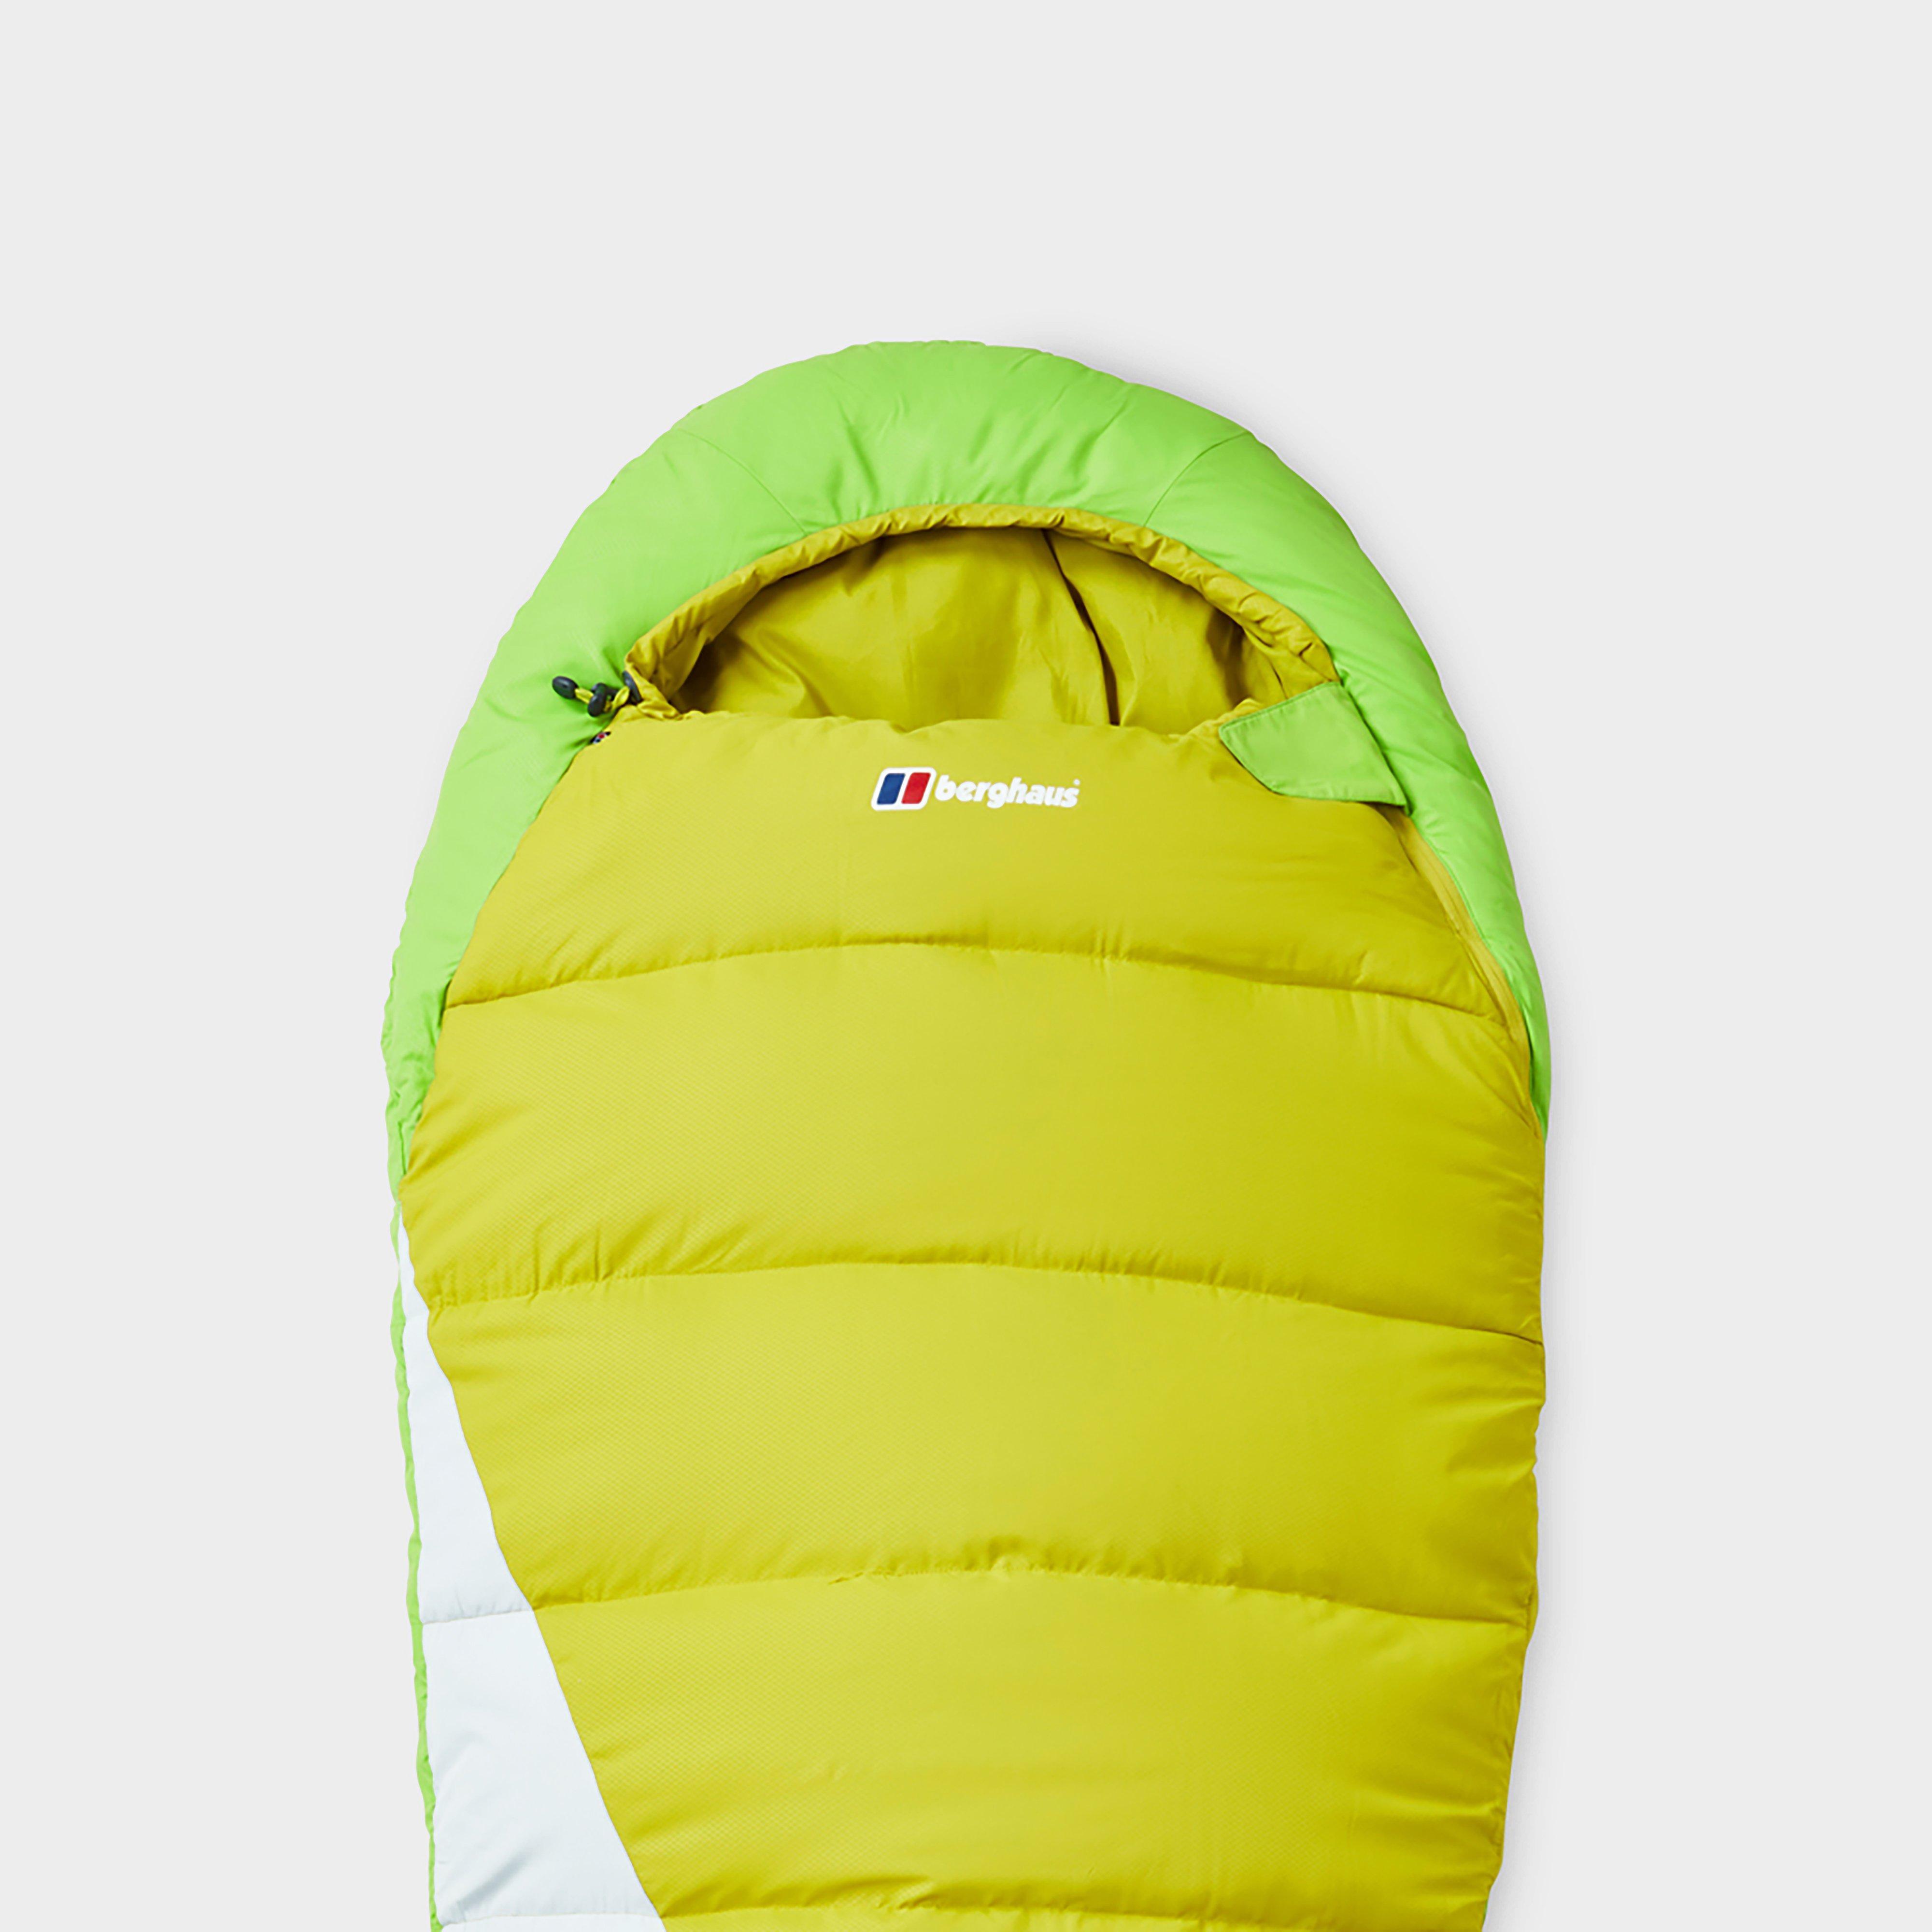 Berghaus Transition 300 Sleeping Bag - Green  Green